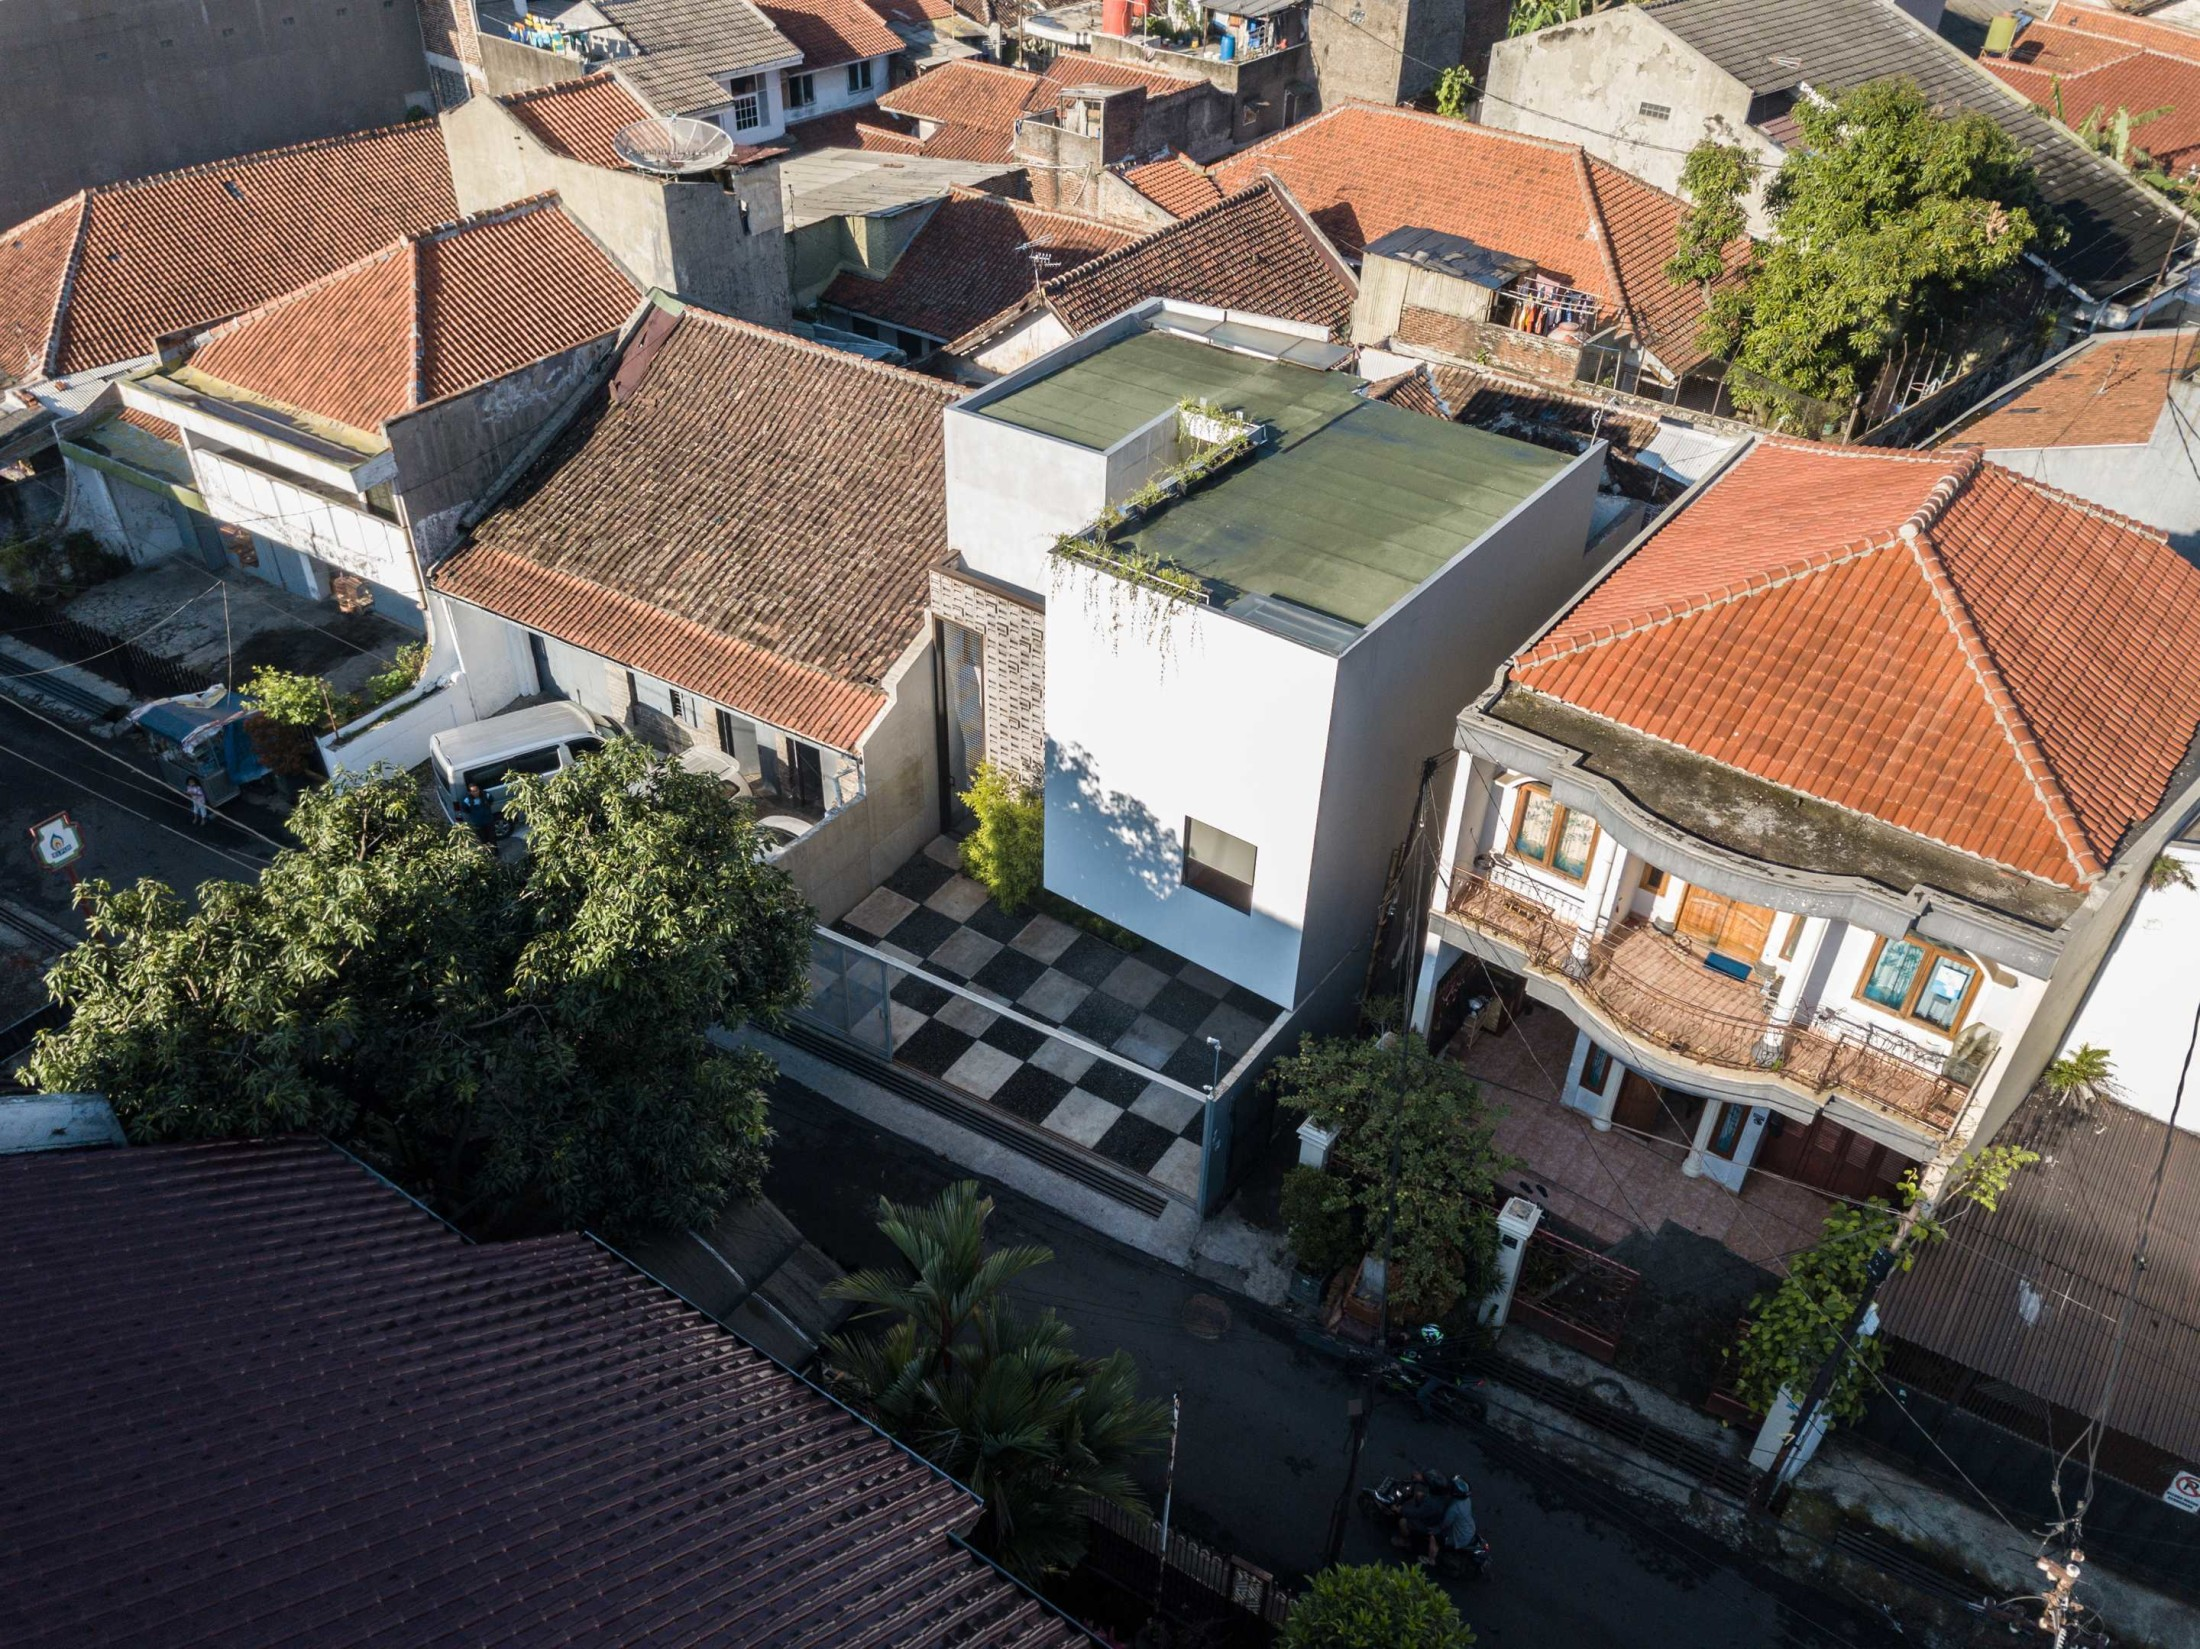 Rumah minimalis dengan permainan garis dan geometri (Sumber: arsitag.com)